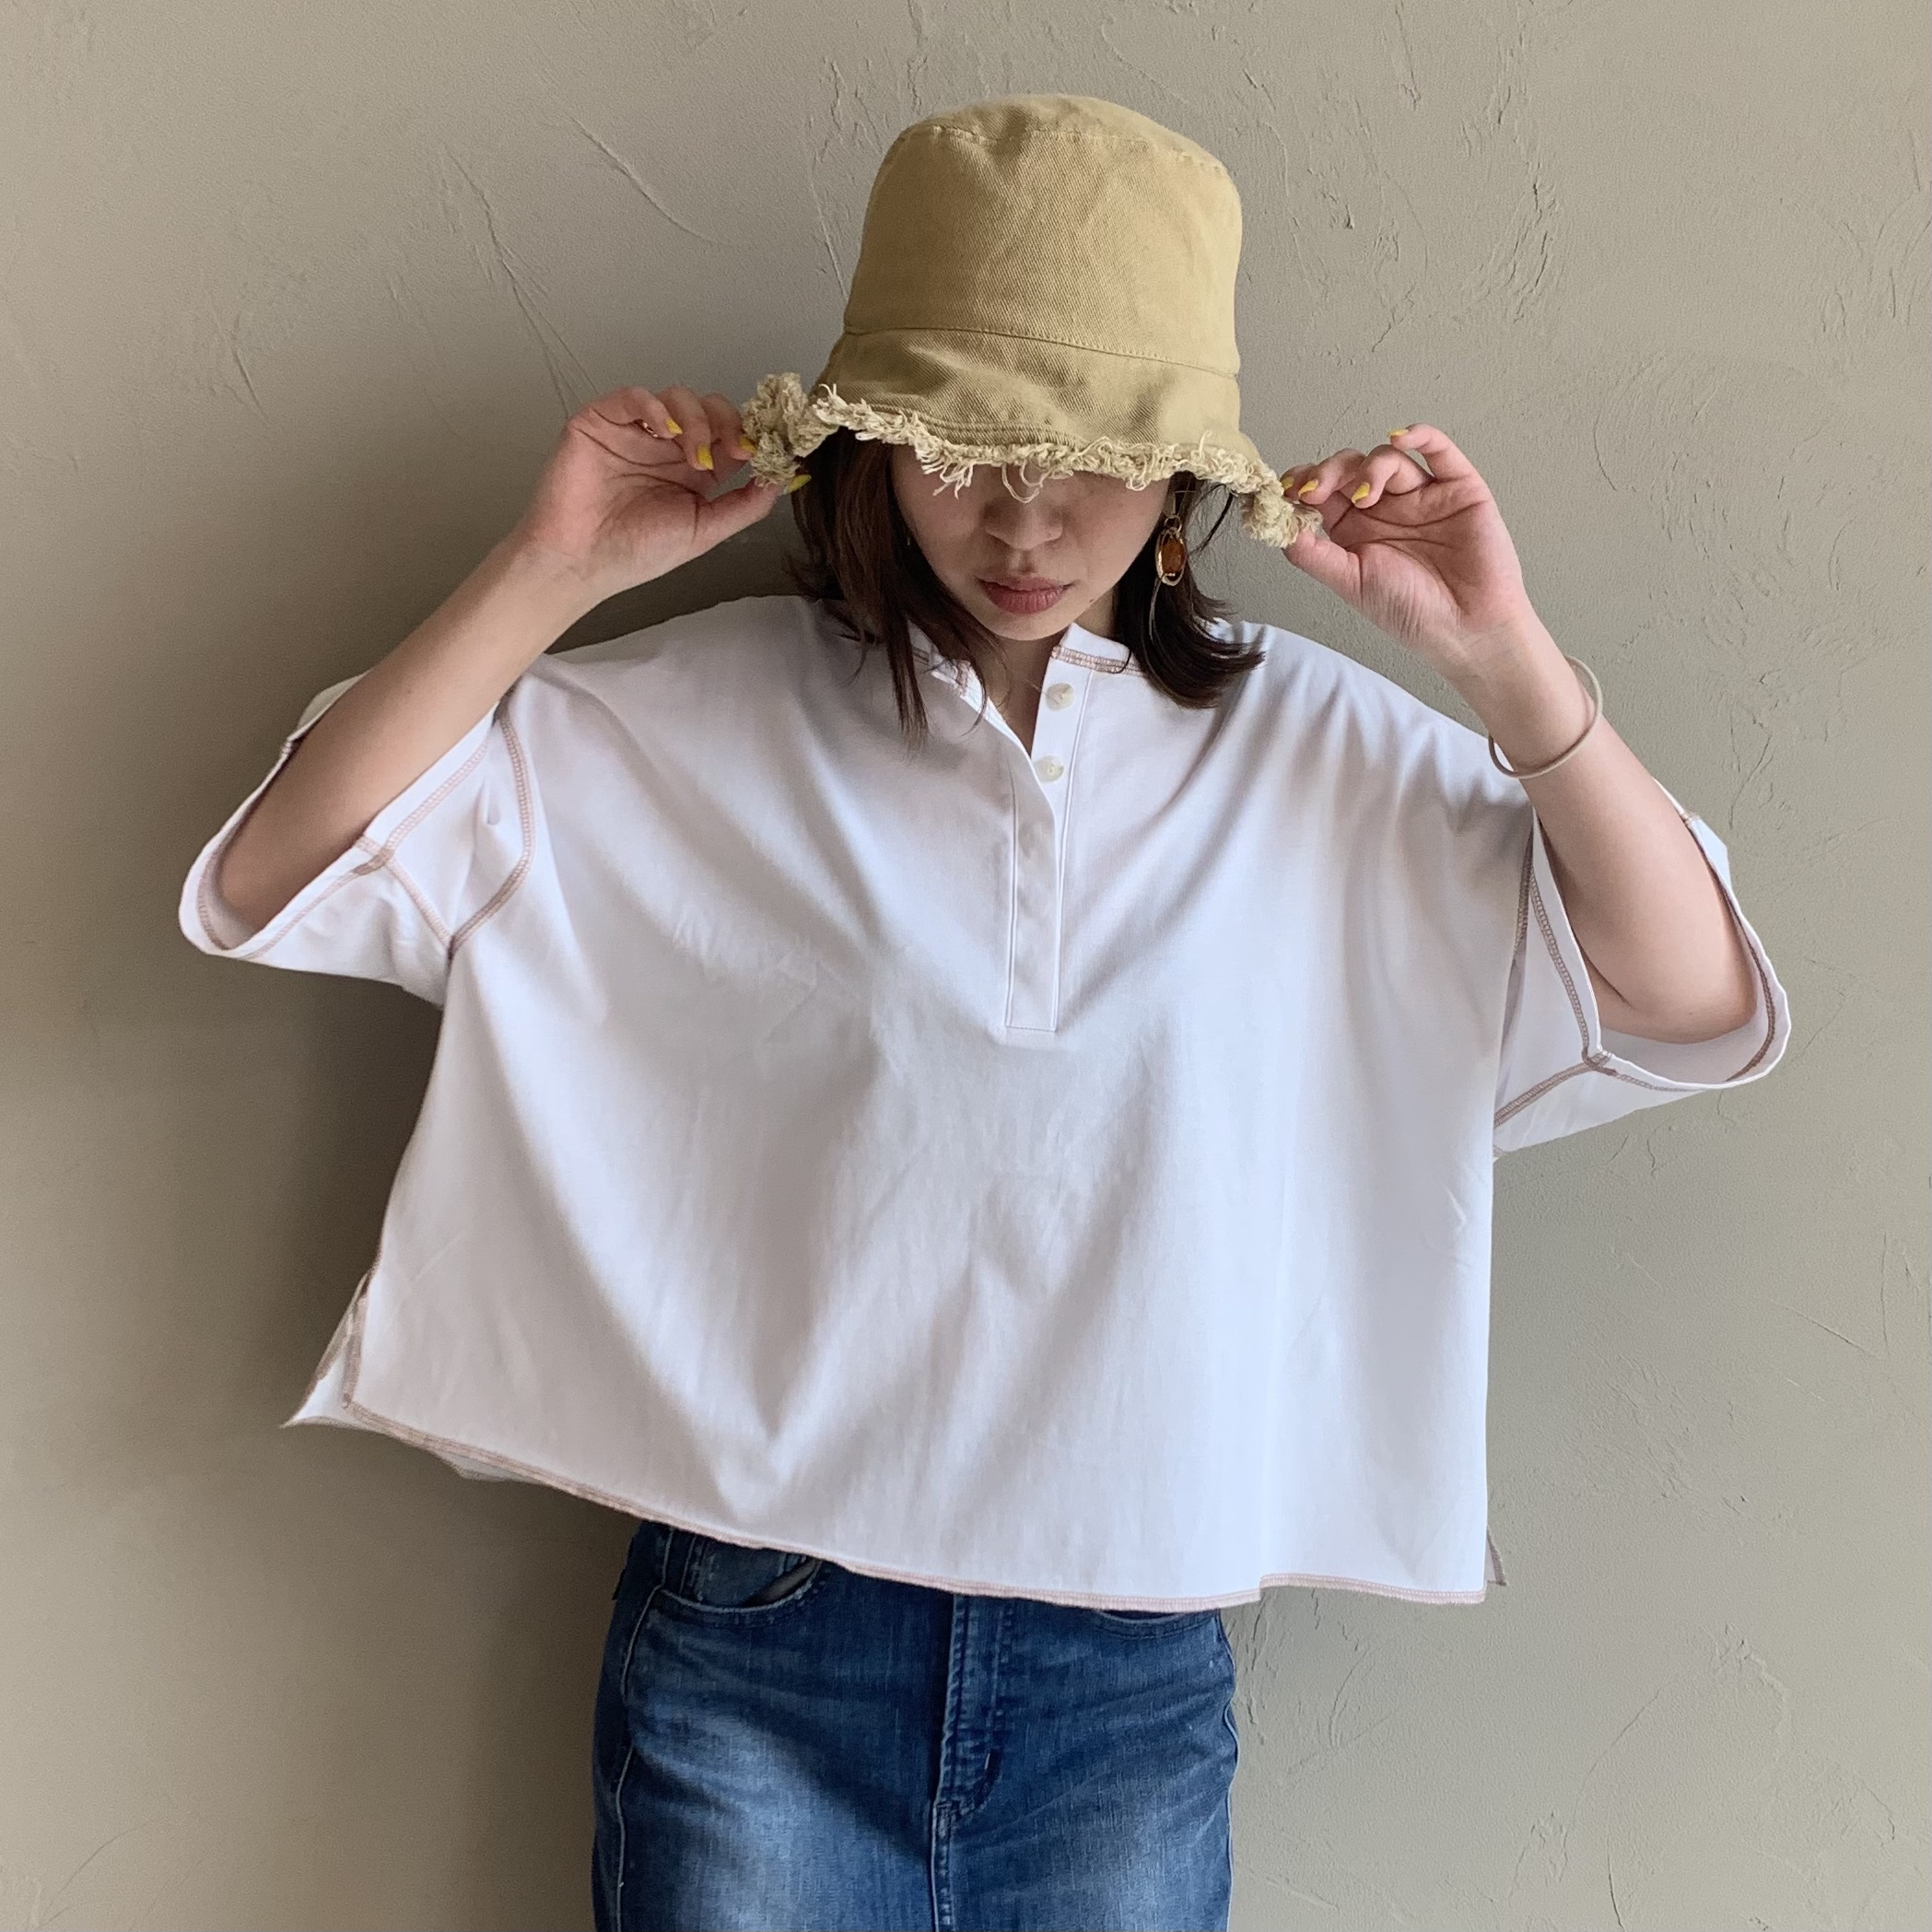 【 ANTGAUGE 】- AB957 - ショート丈オーバーTシャツ